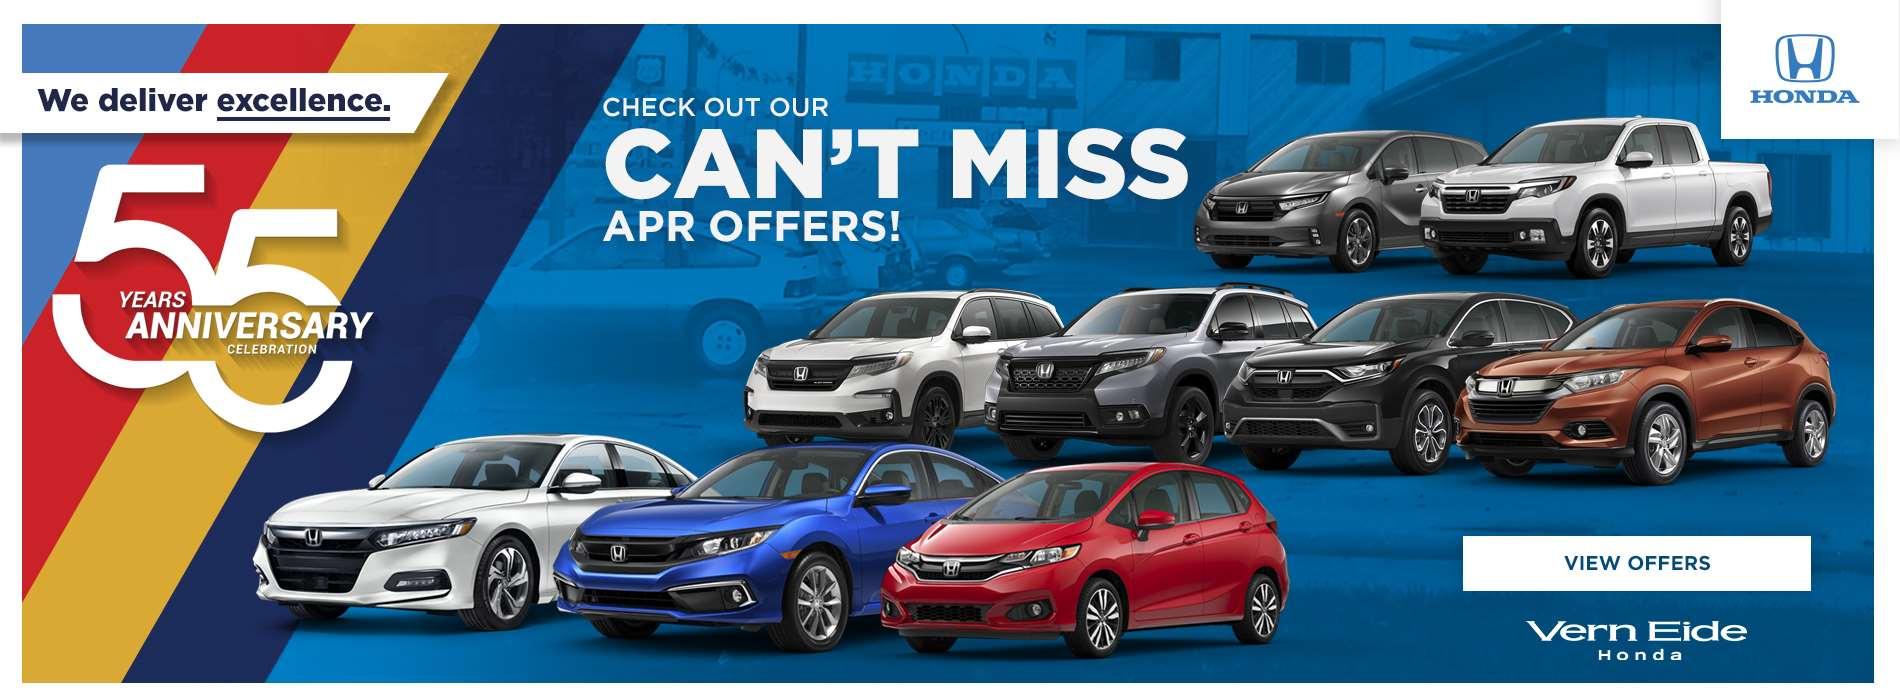 VHON - Can't Miss APR Offers - October 2020